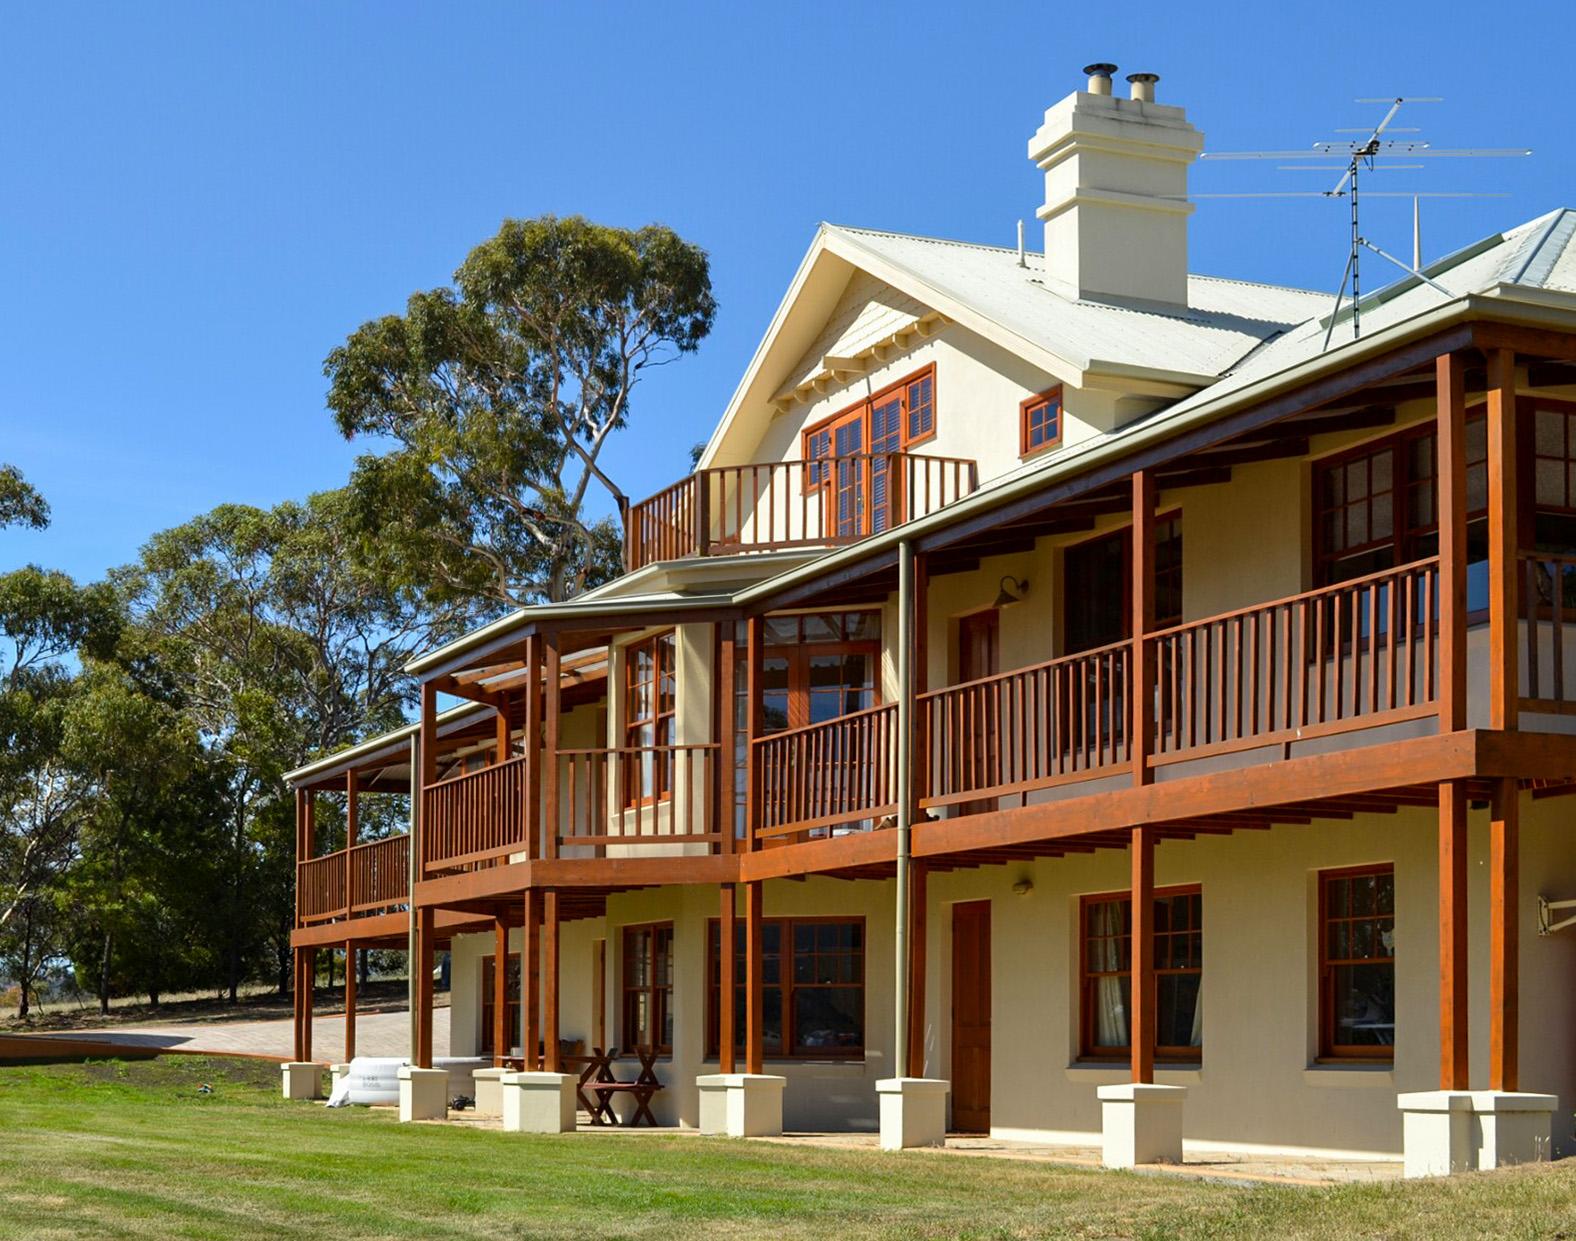 Otago Cottage and Bungalow, Hobart Australia - Julia Reynolds.jpg